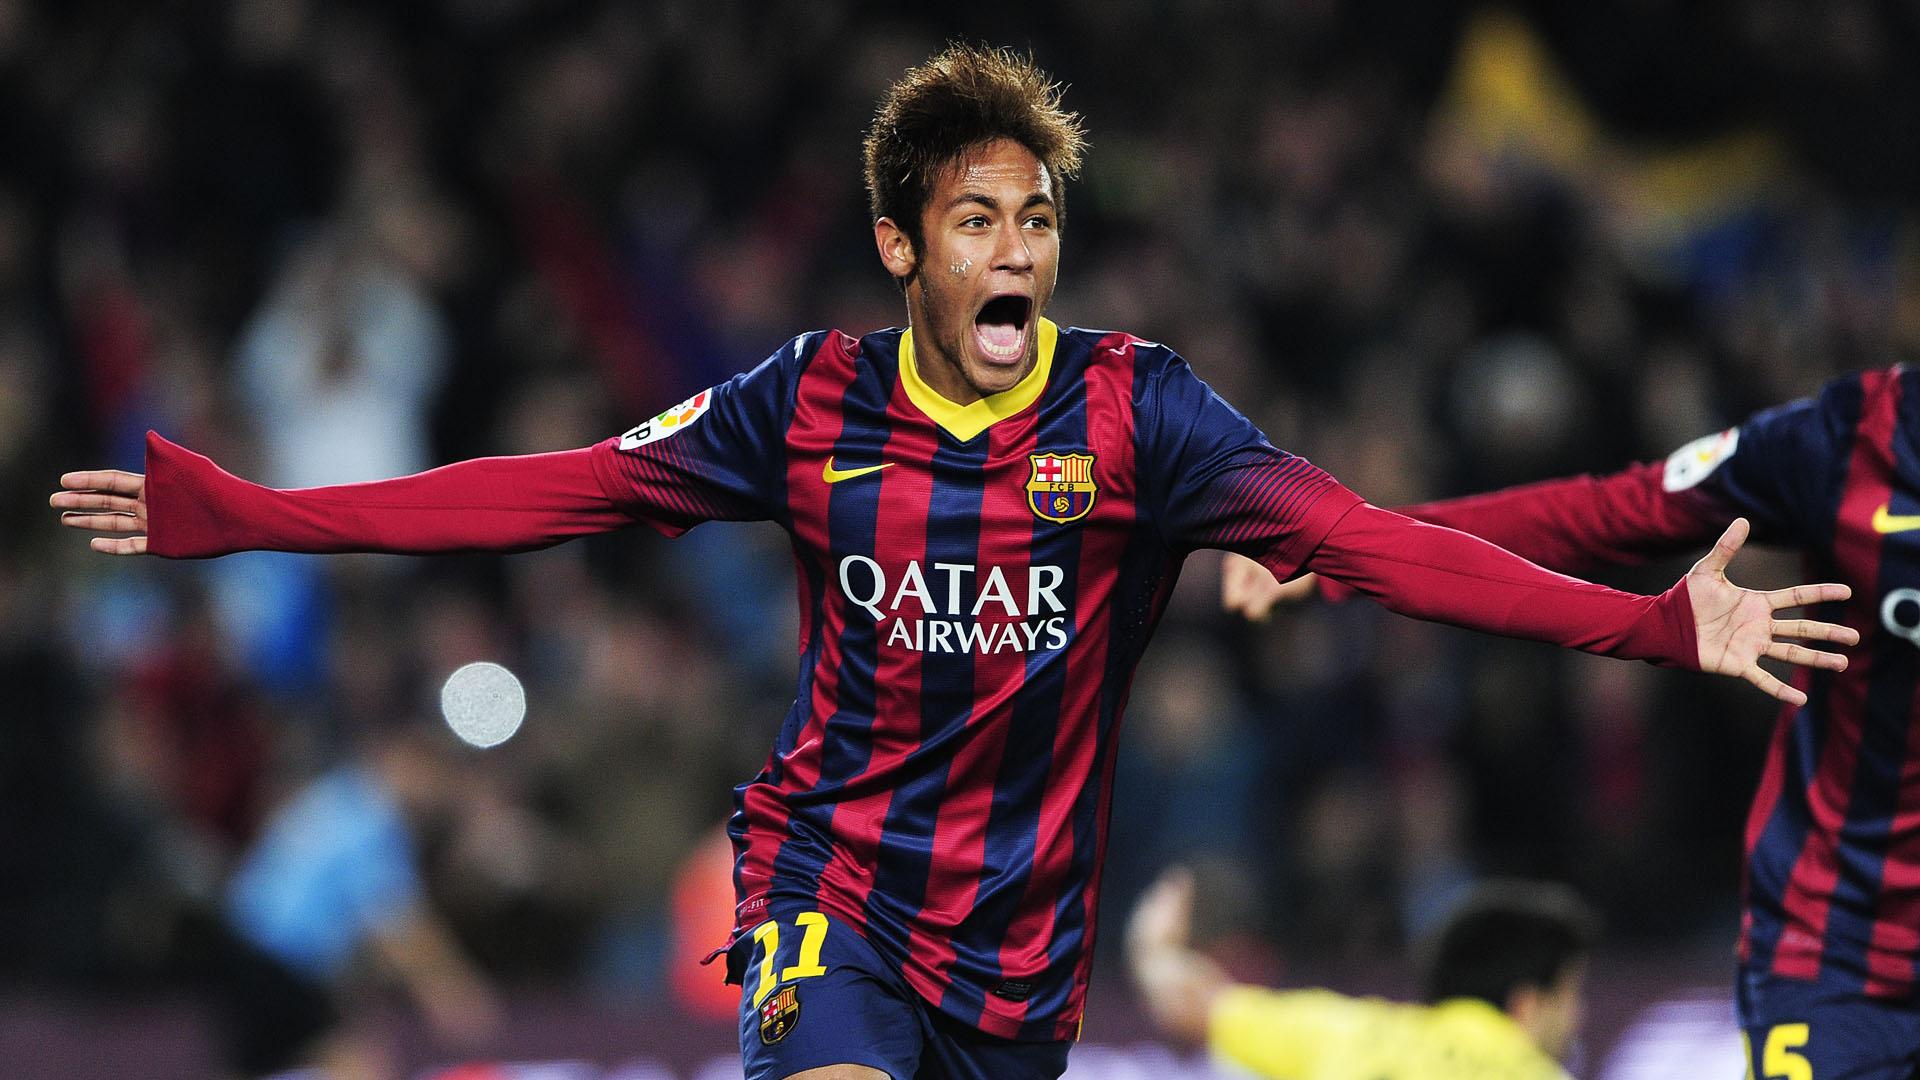 Hd Pictures Of Neymar - wallpaper hd